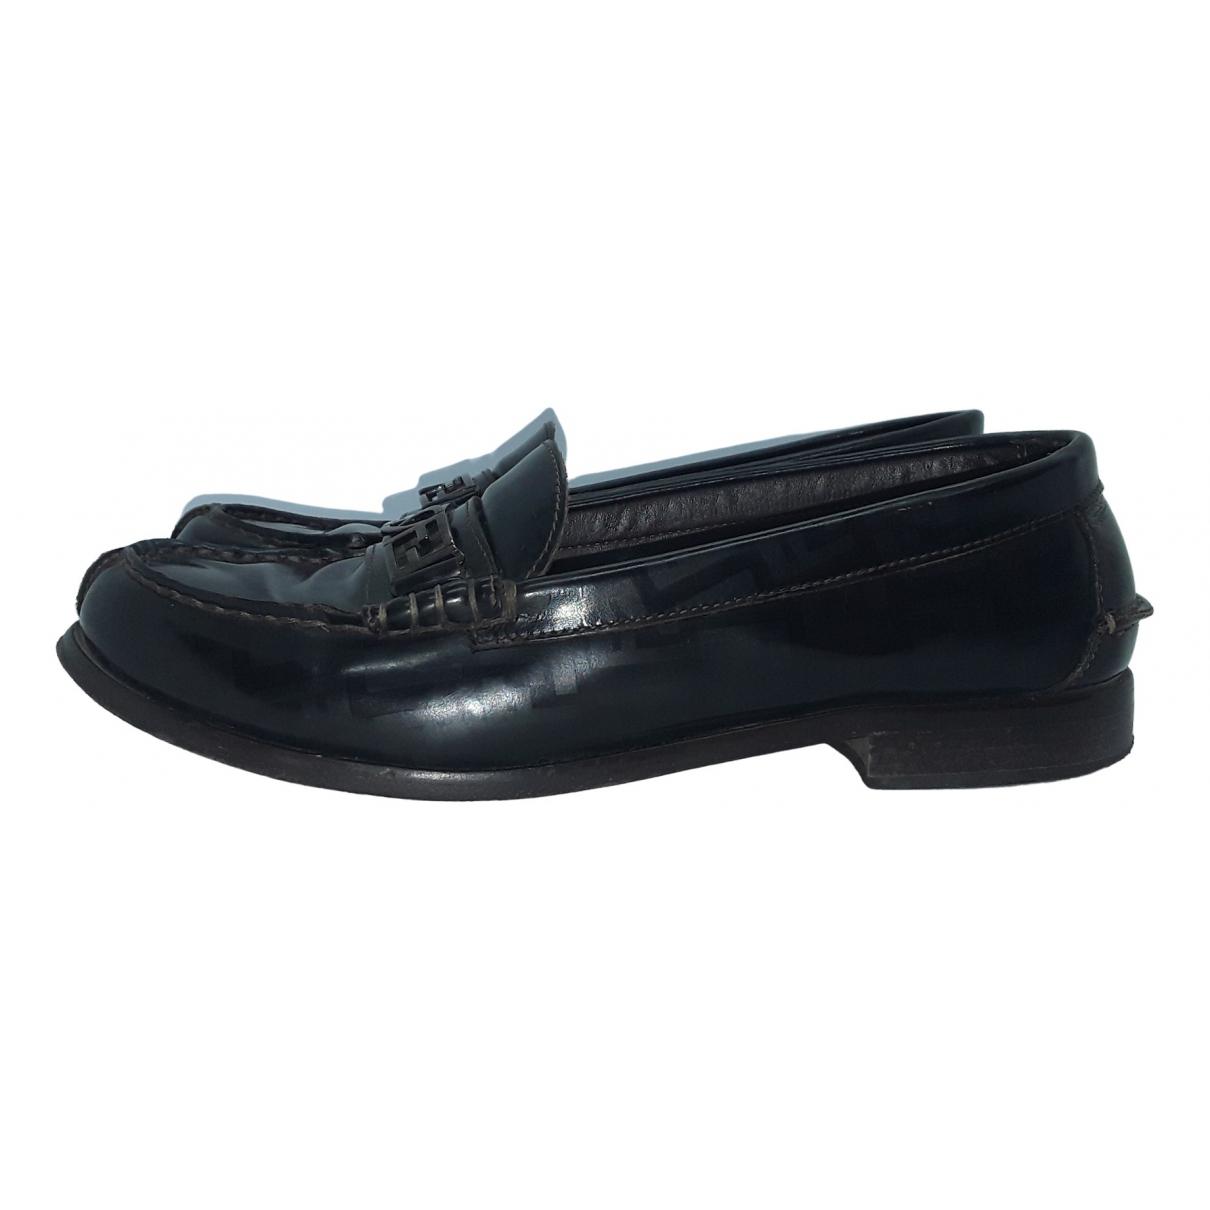 Fendi \N Brown Leather Flats for Women 36 EU